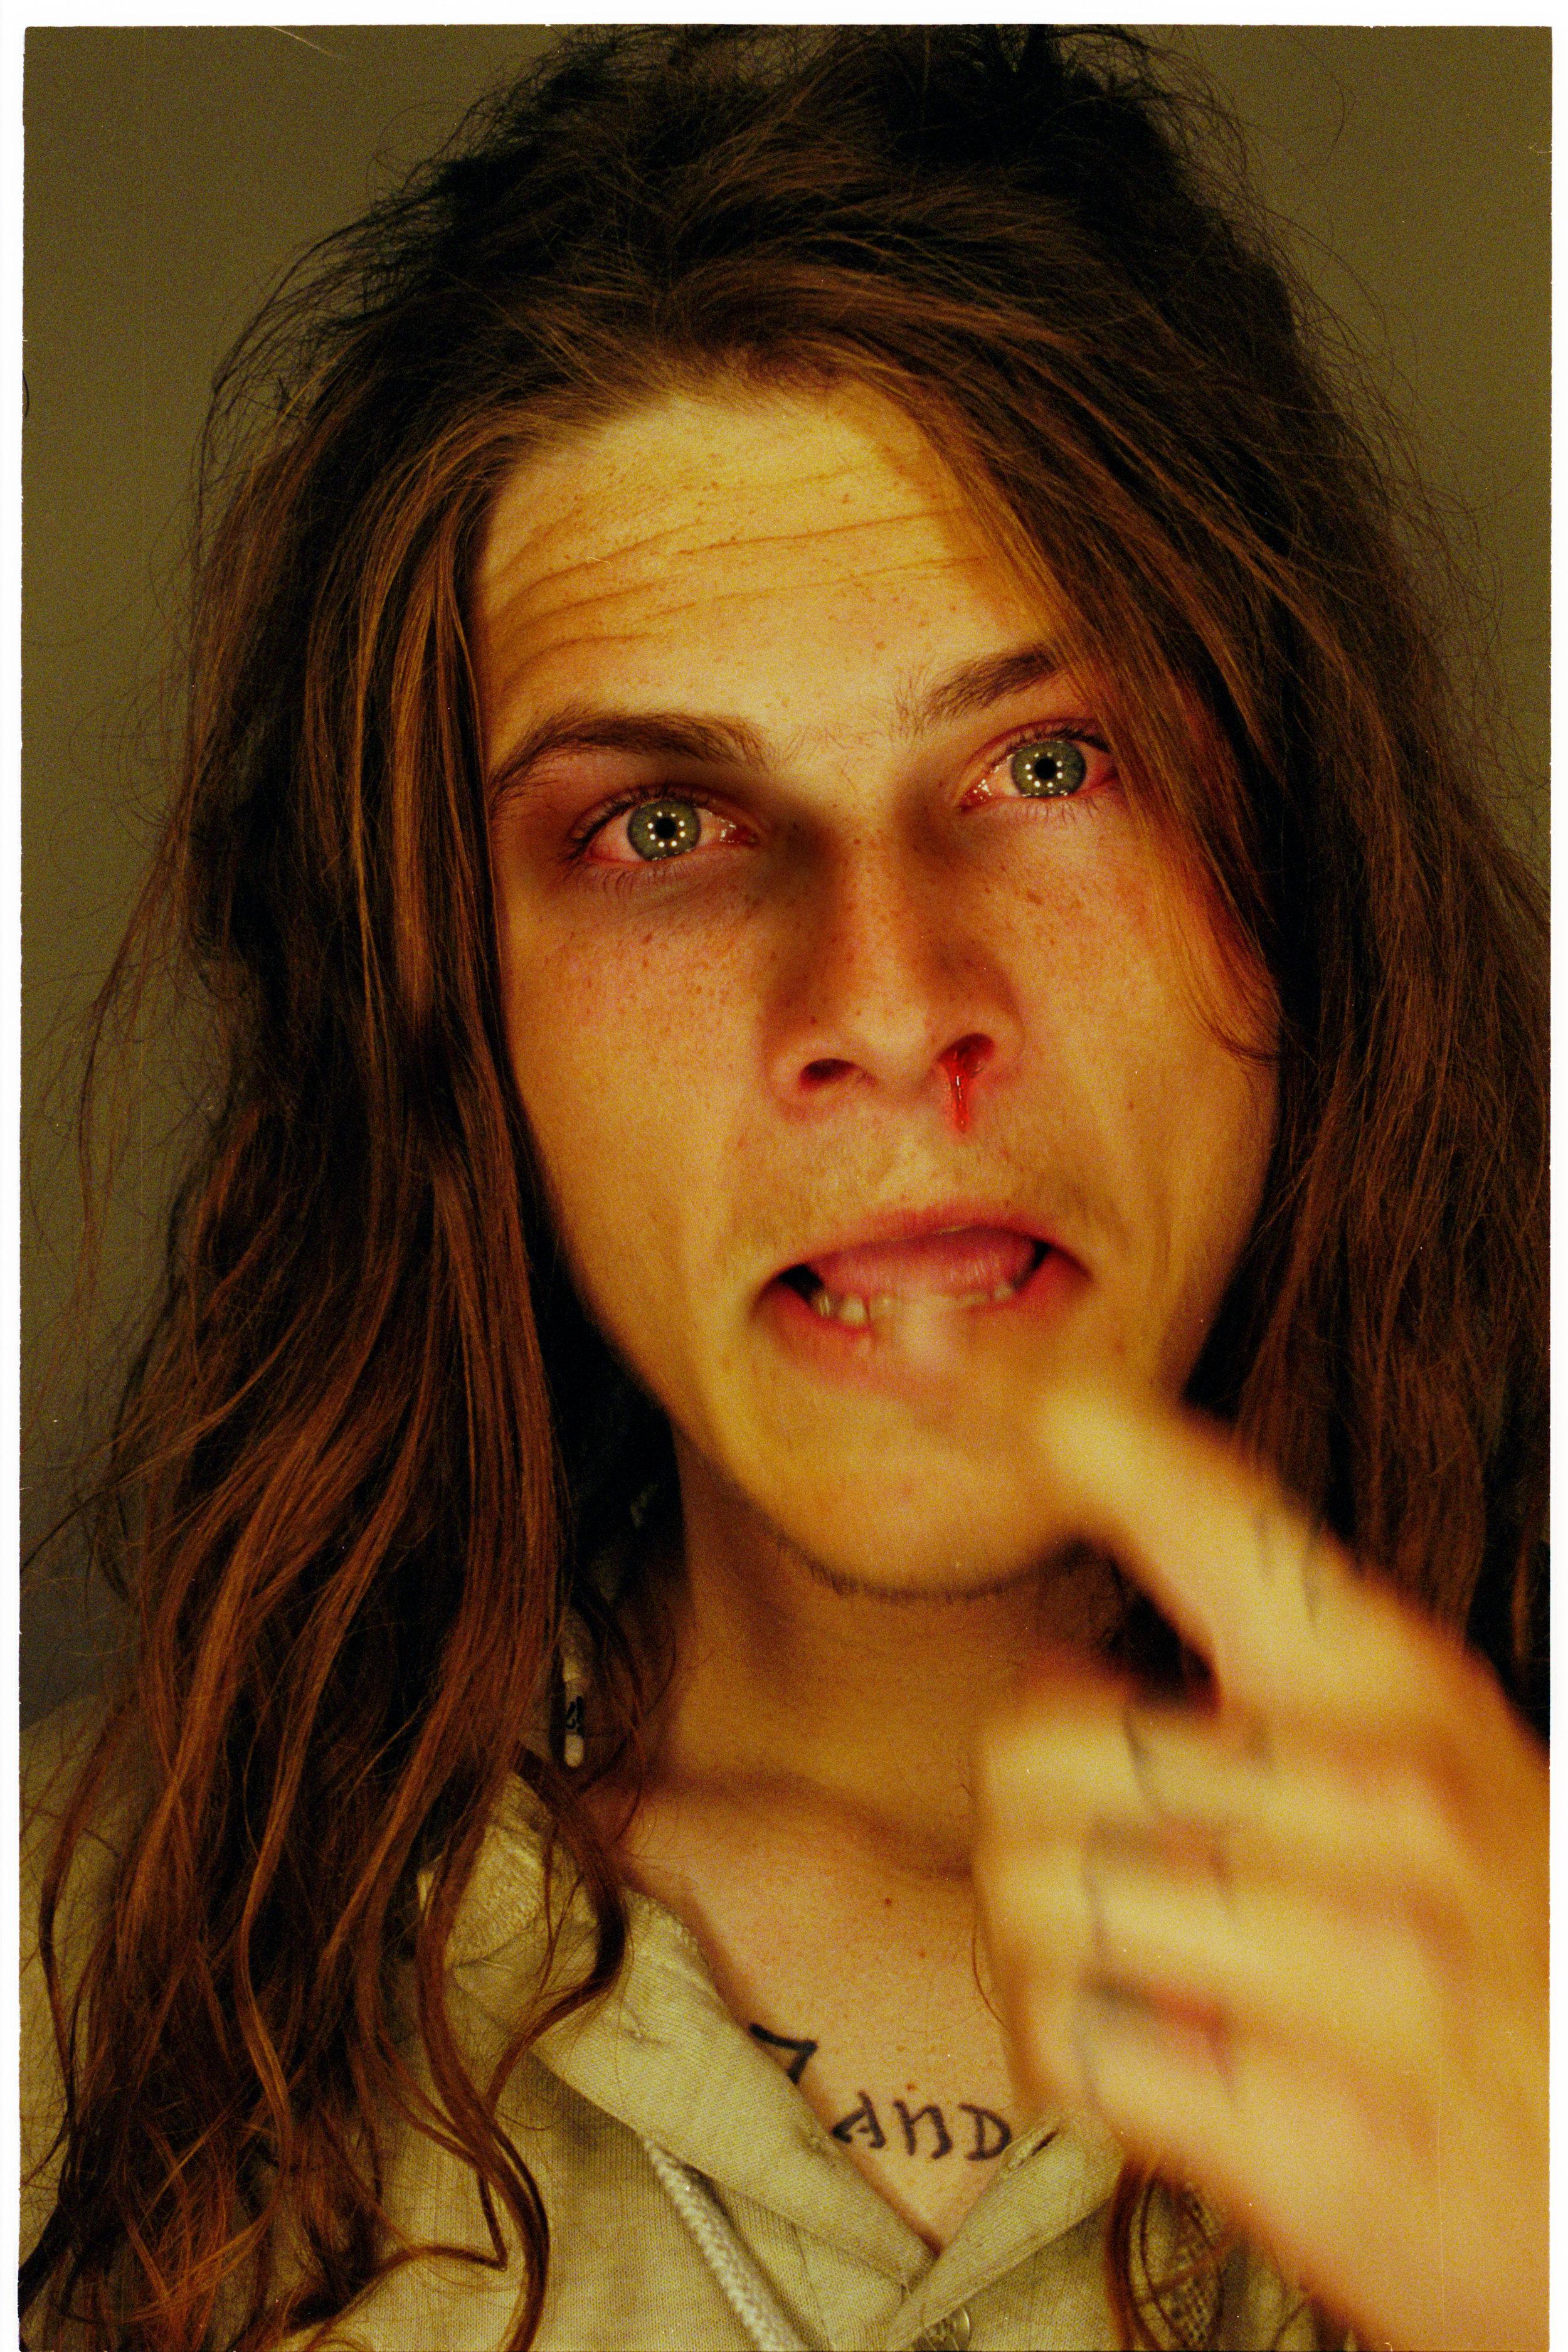 95-Richie_Belton_Beat-Broach-Photo.jpg